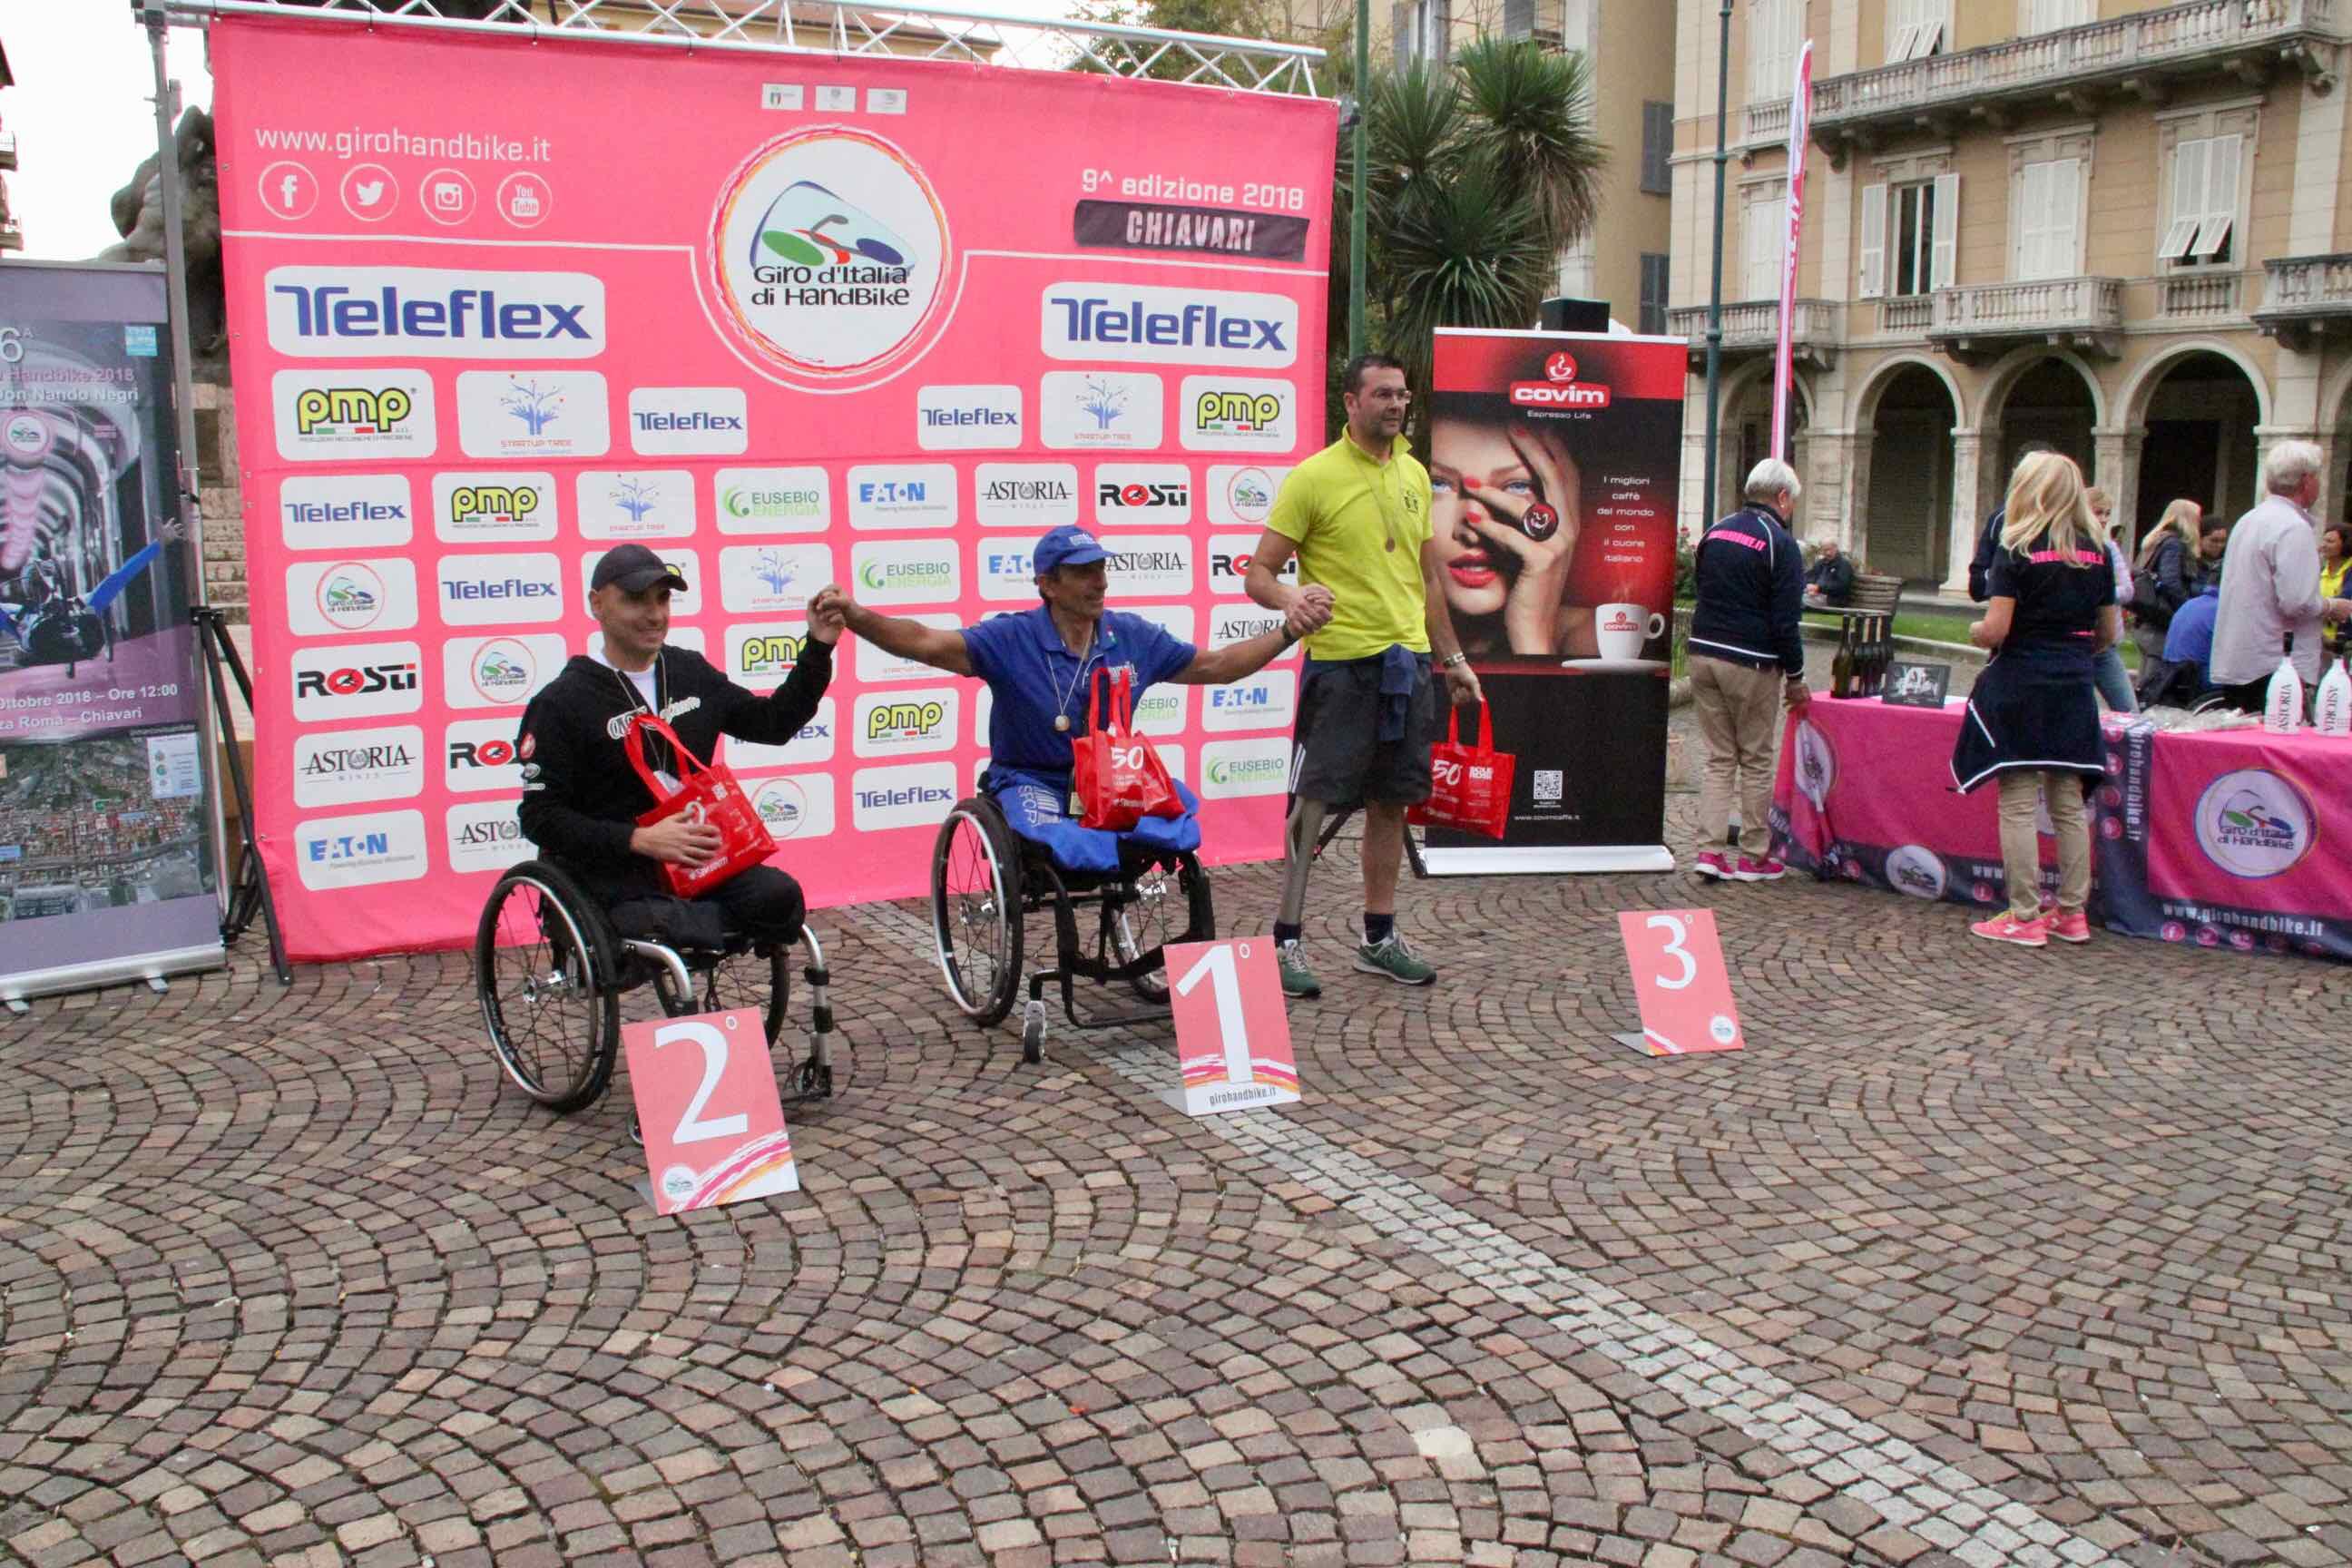 1° Memorial don Nando Negri a Chiavari per il Giro d'Italia Handbike 2018 - 23